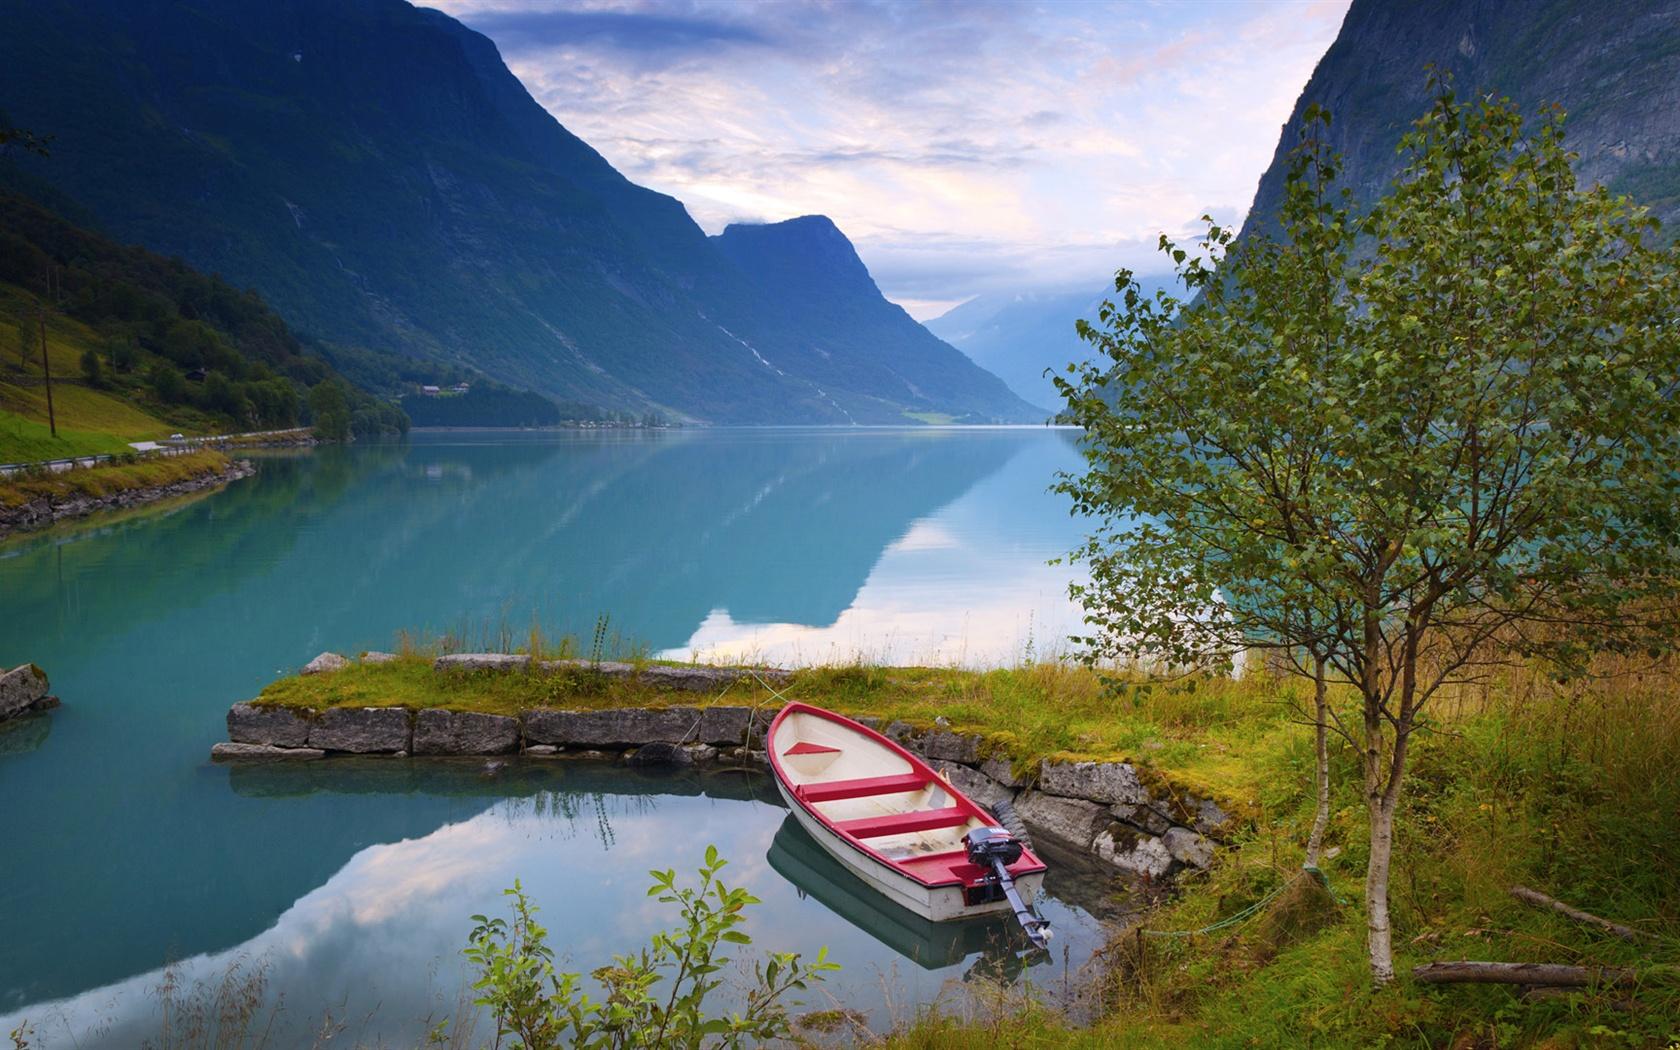 Download boat in the fjord 1920x1080 hd wallpaper - Norwegen Sch 246 Ne Natur Landschaft See Berge Wolken